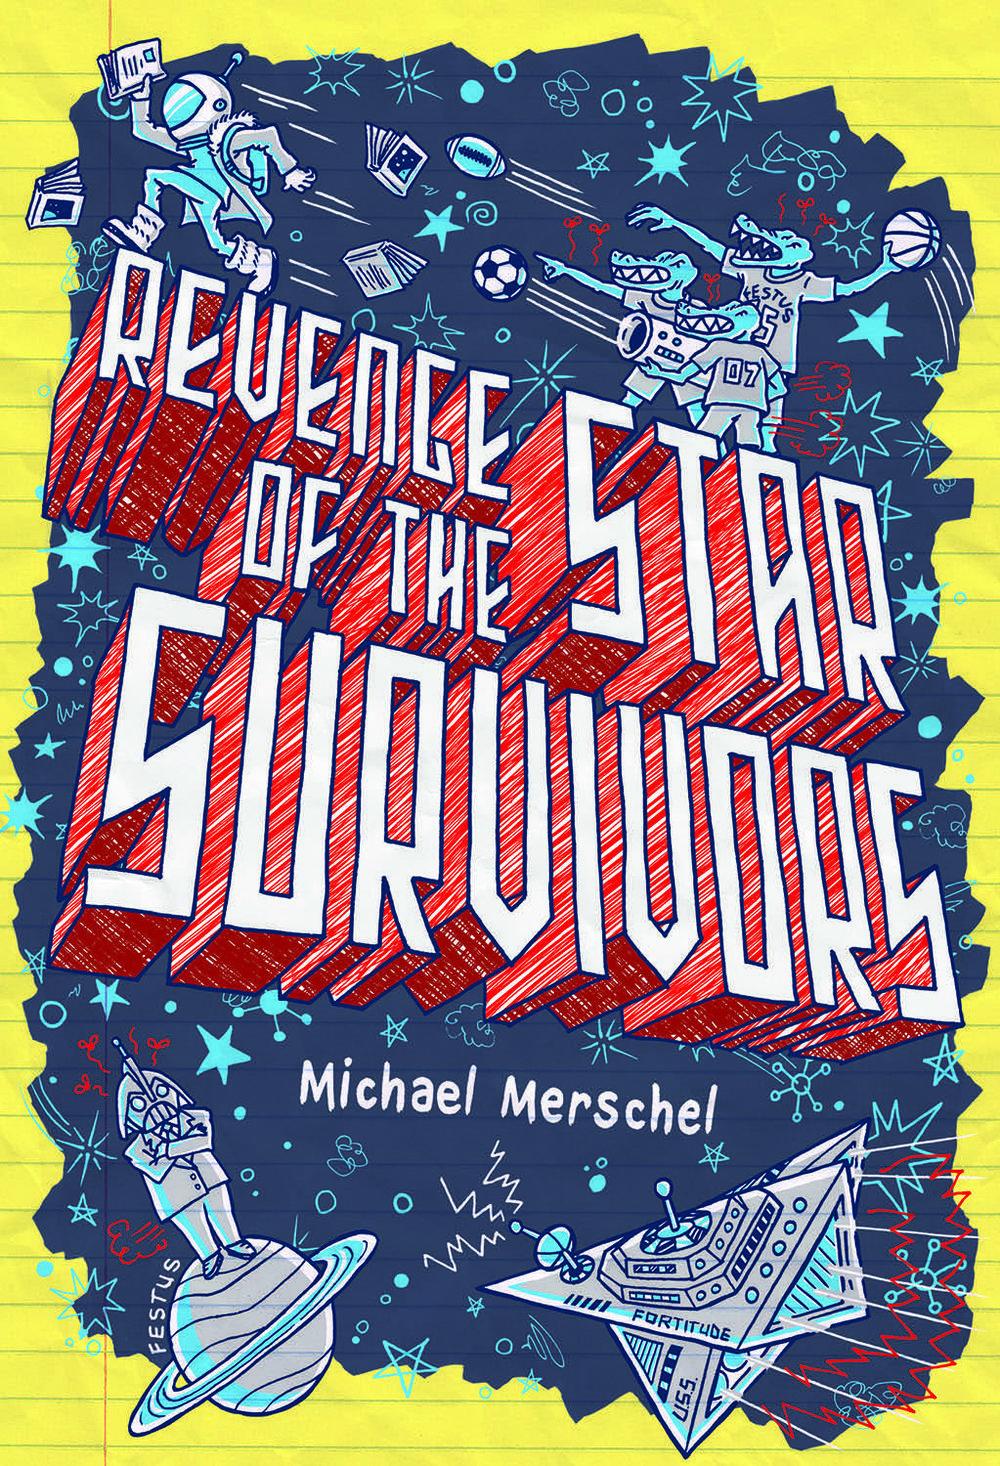 michael-merschel-revenge-star-survivors.jpg